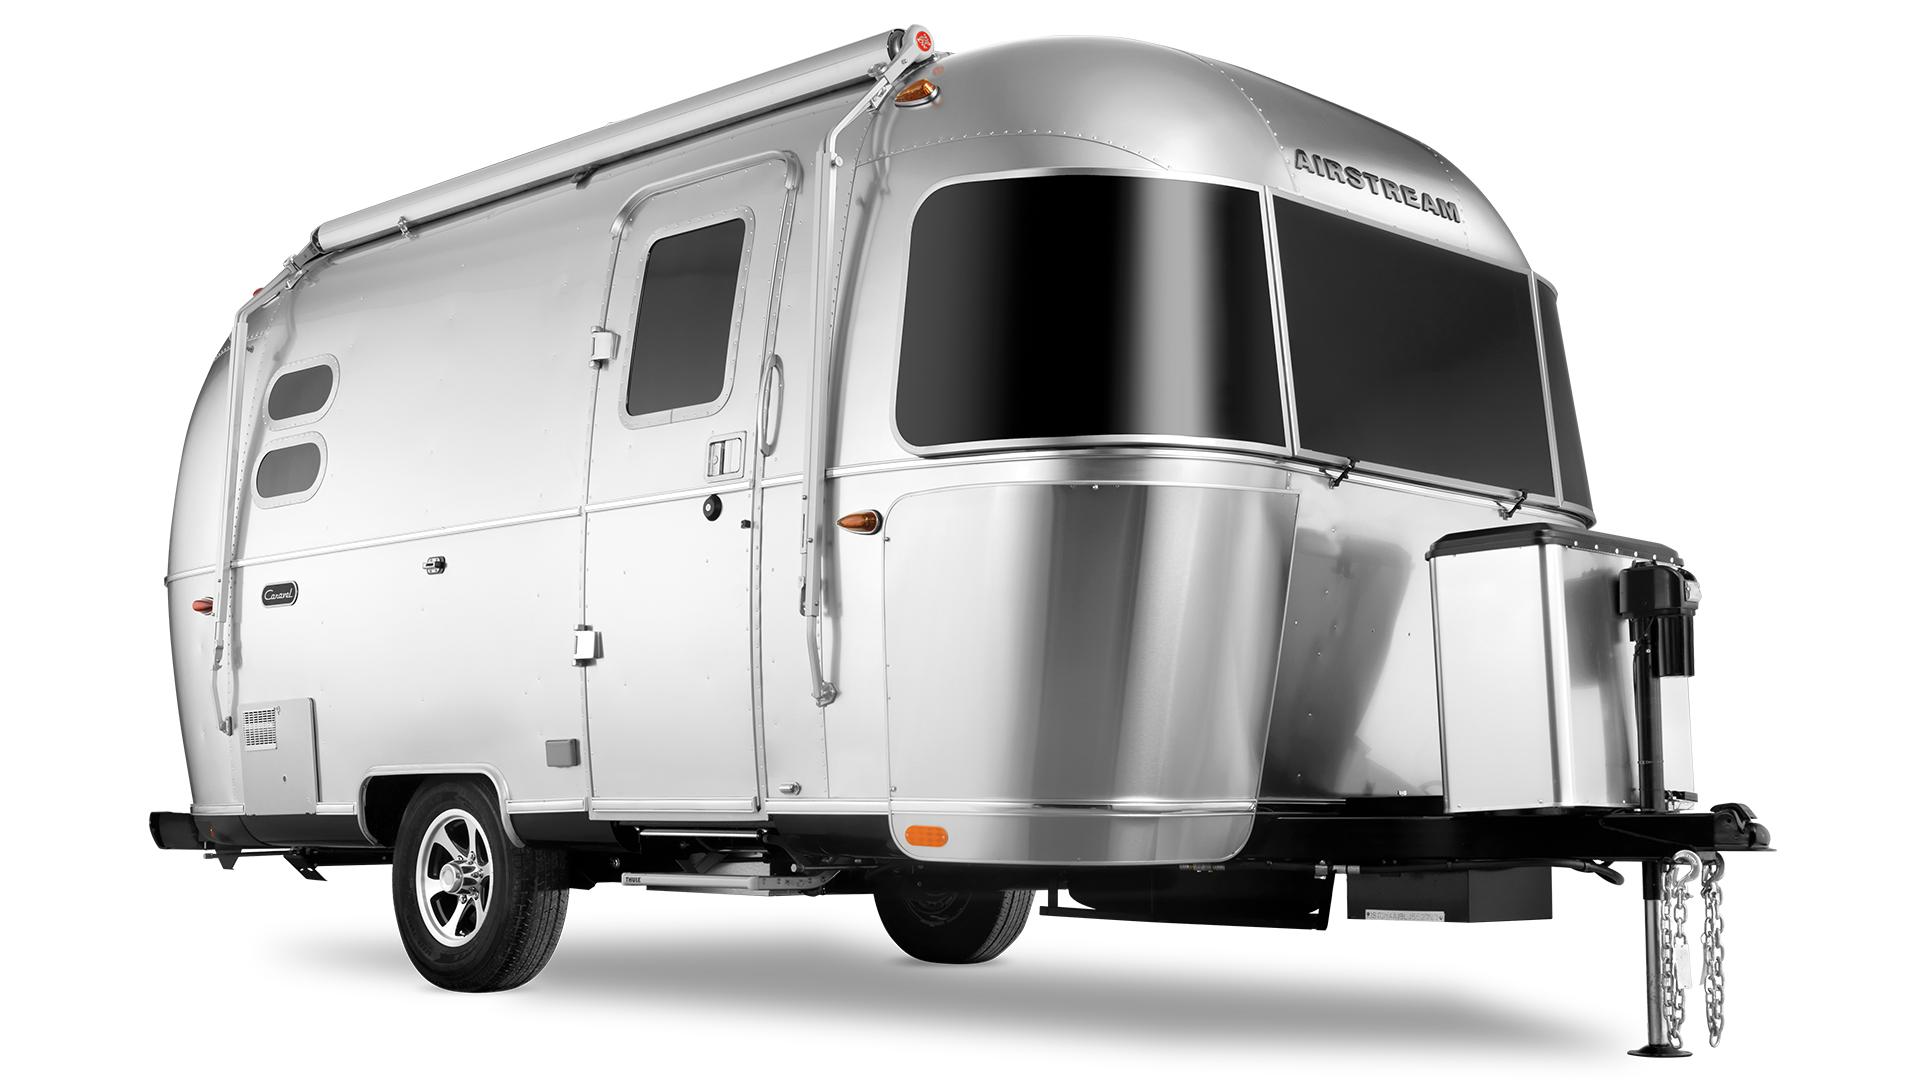 Caravel 19cb Floor Plan Travel Trailers New Small Airstream Rv Trailer